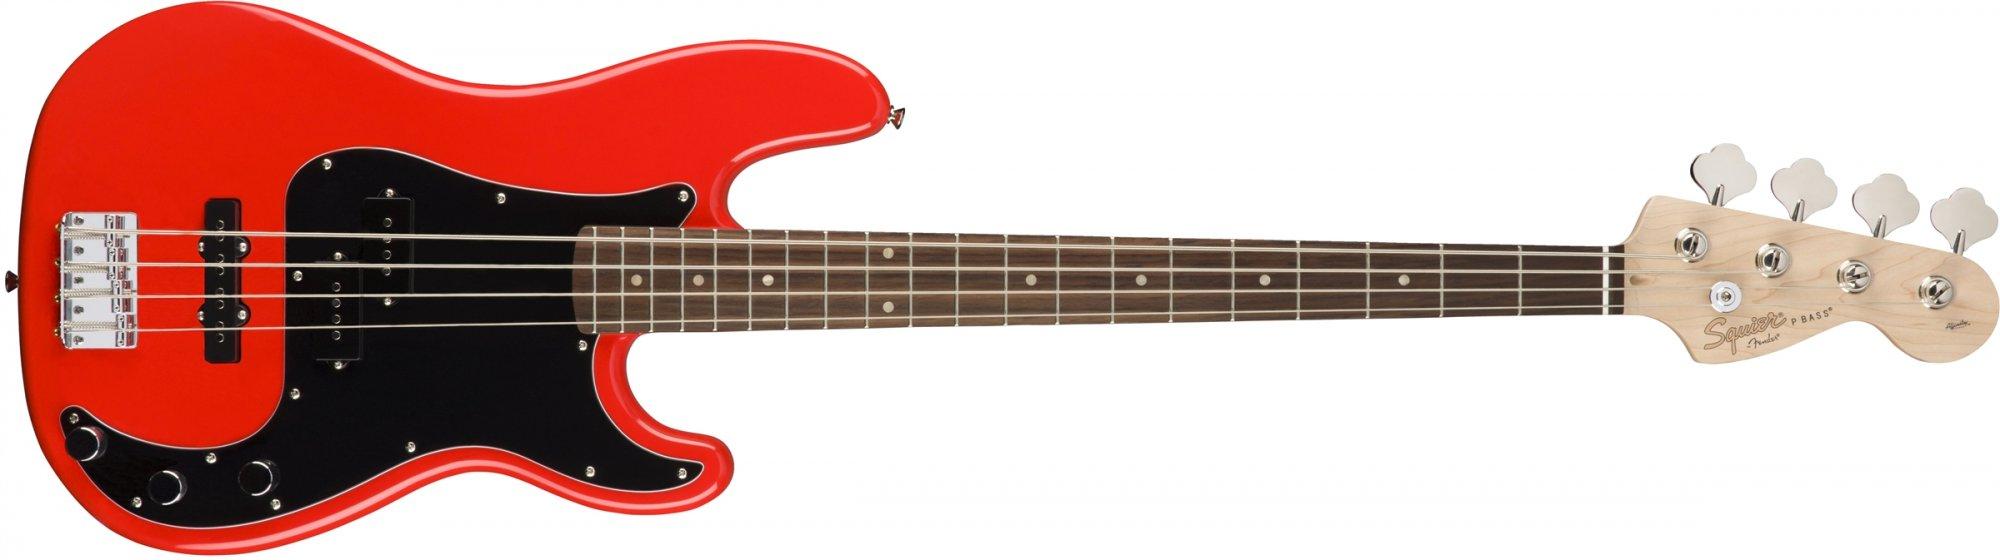 PJ Bass Affinity LRL RCR